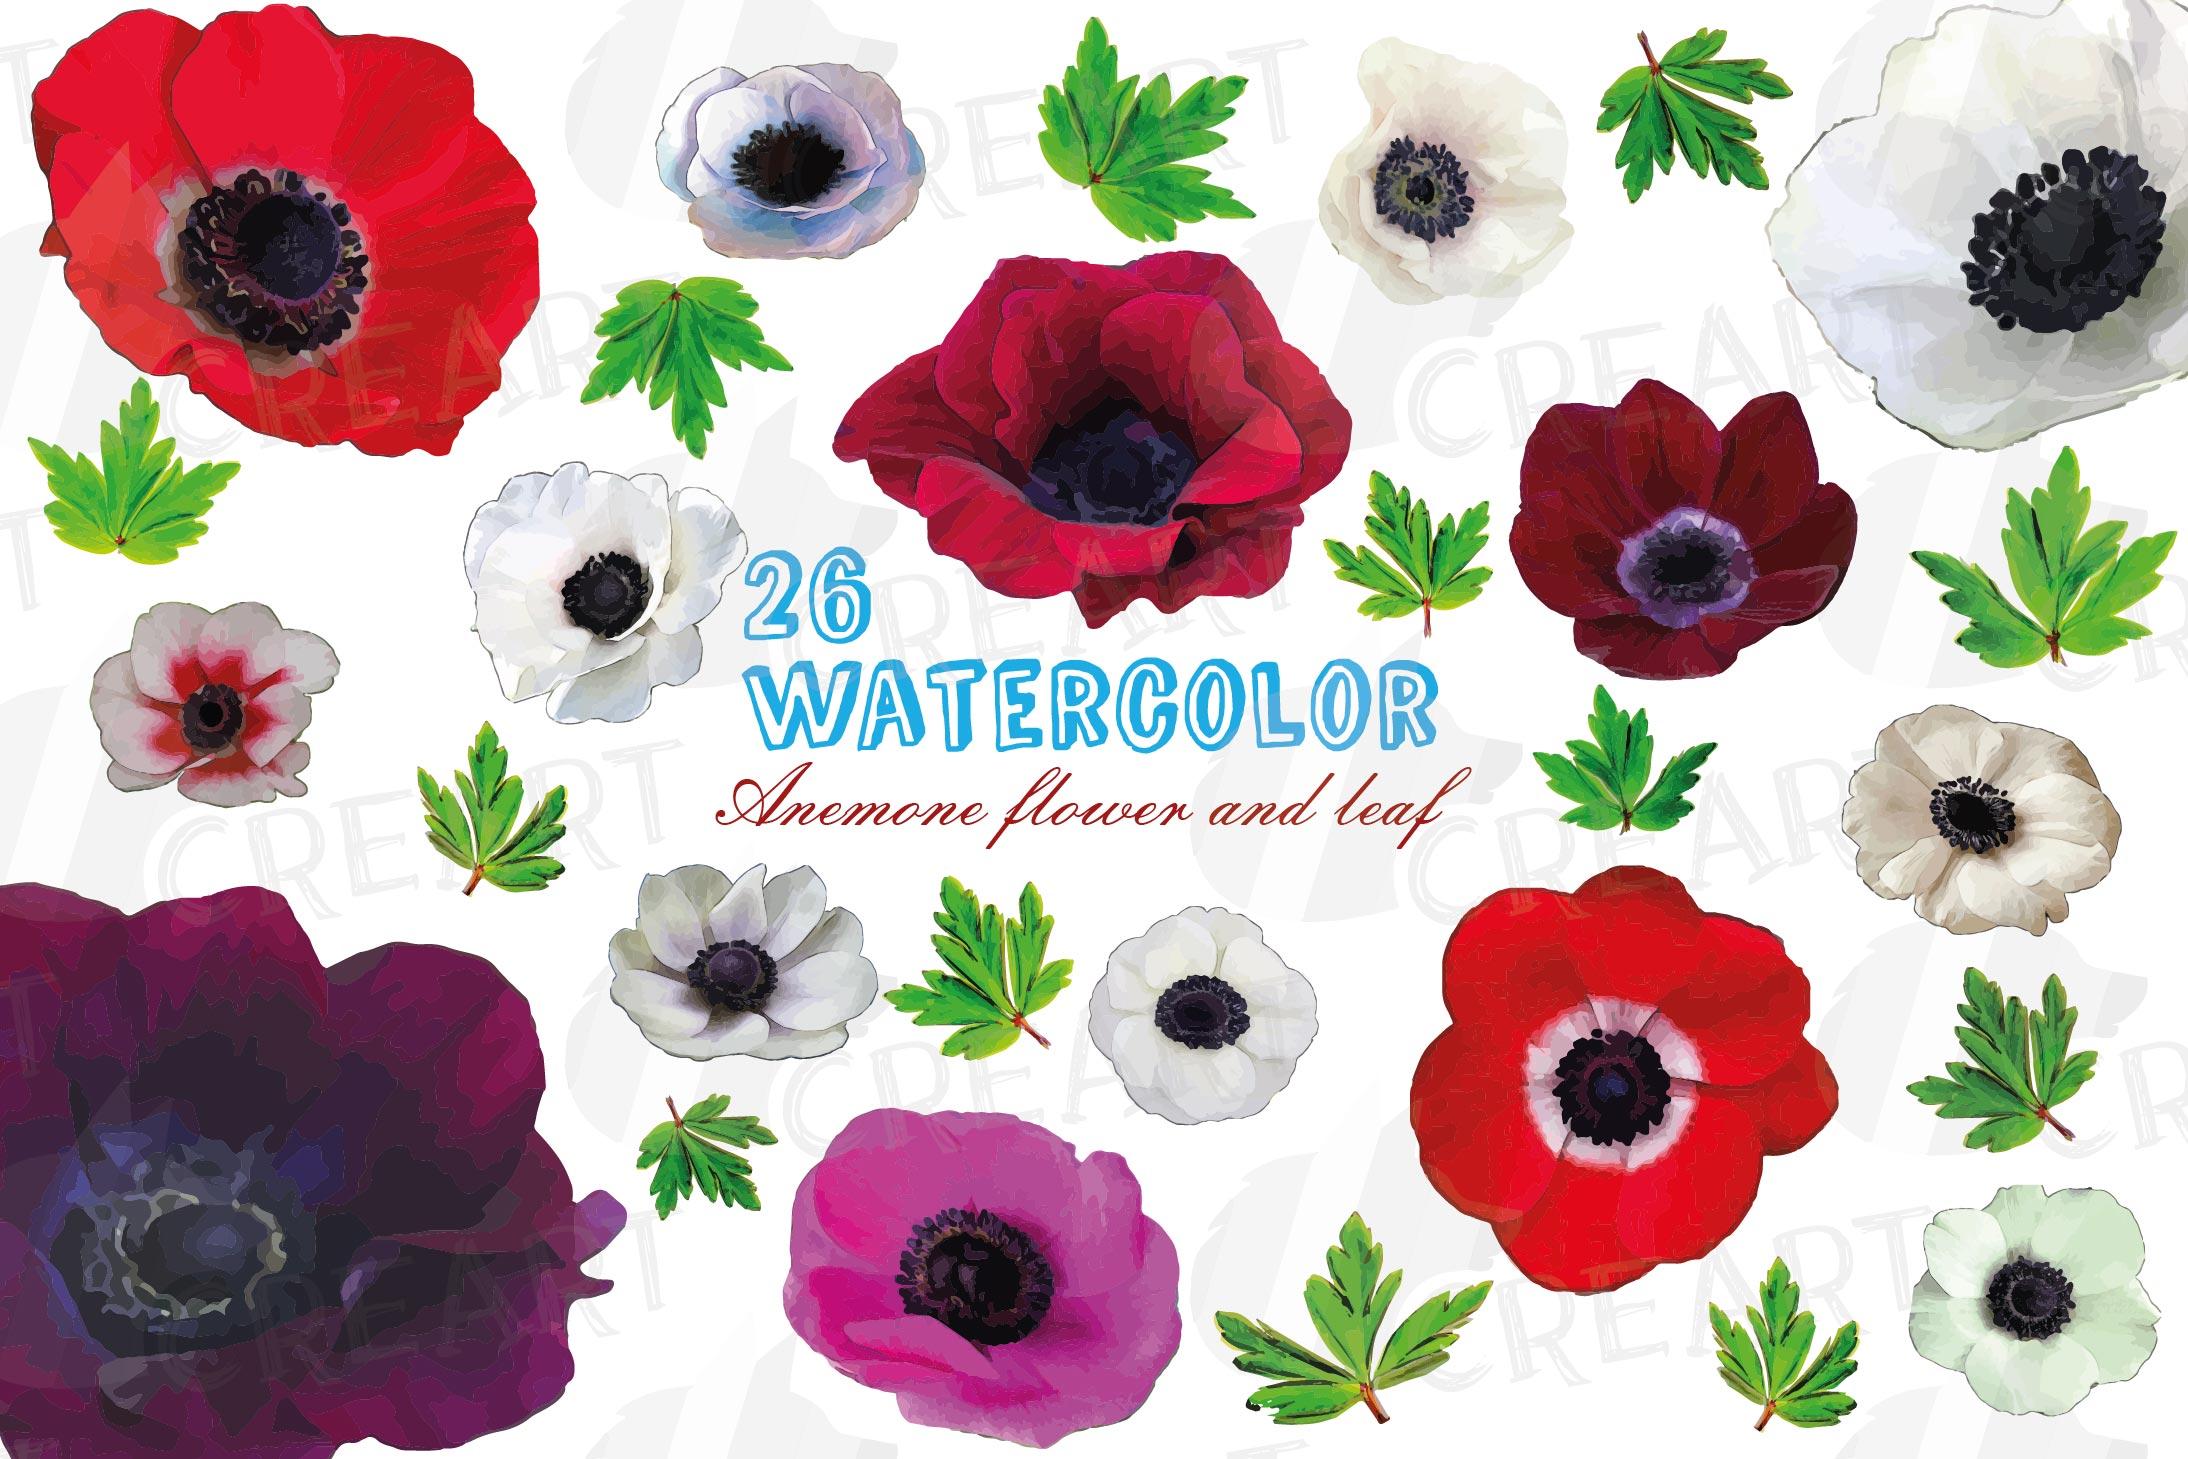 Anemone watercolor clip art pack, watercolor anemone design example image 1